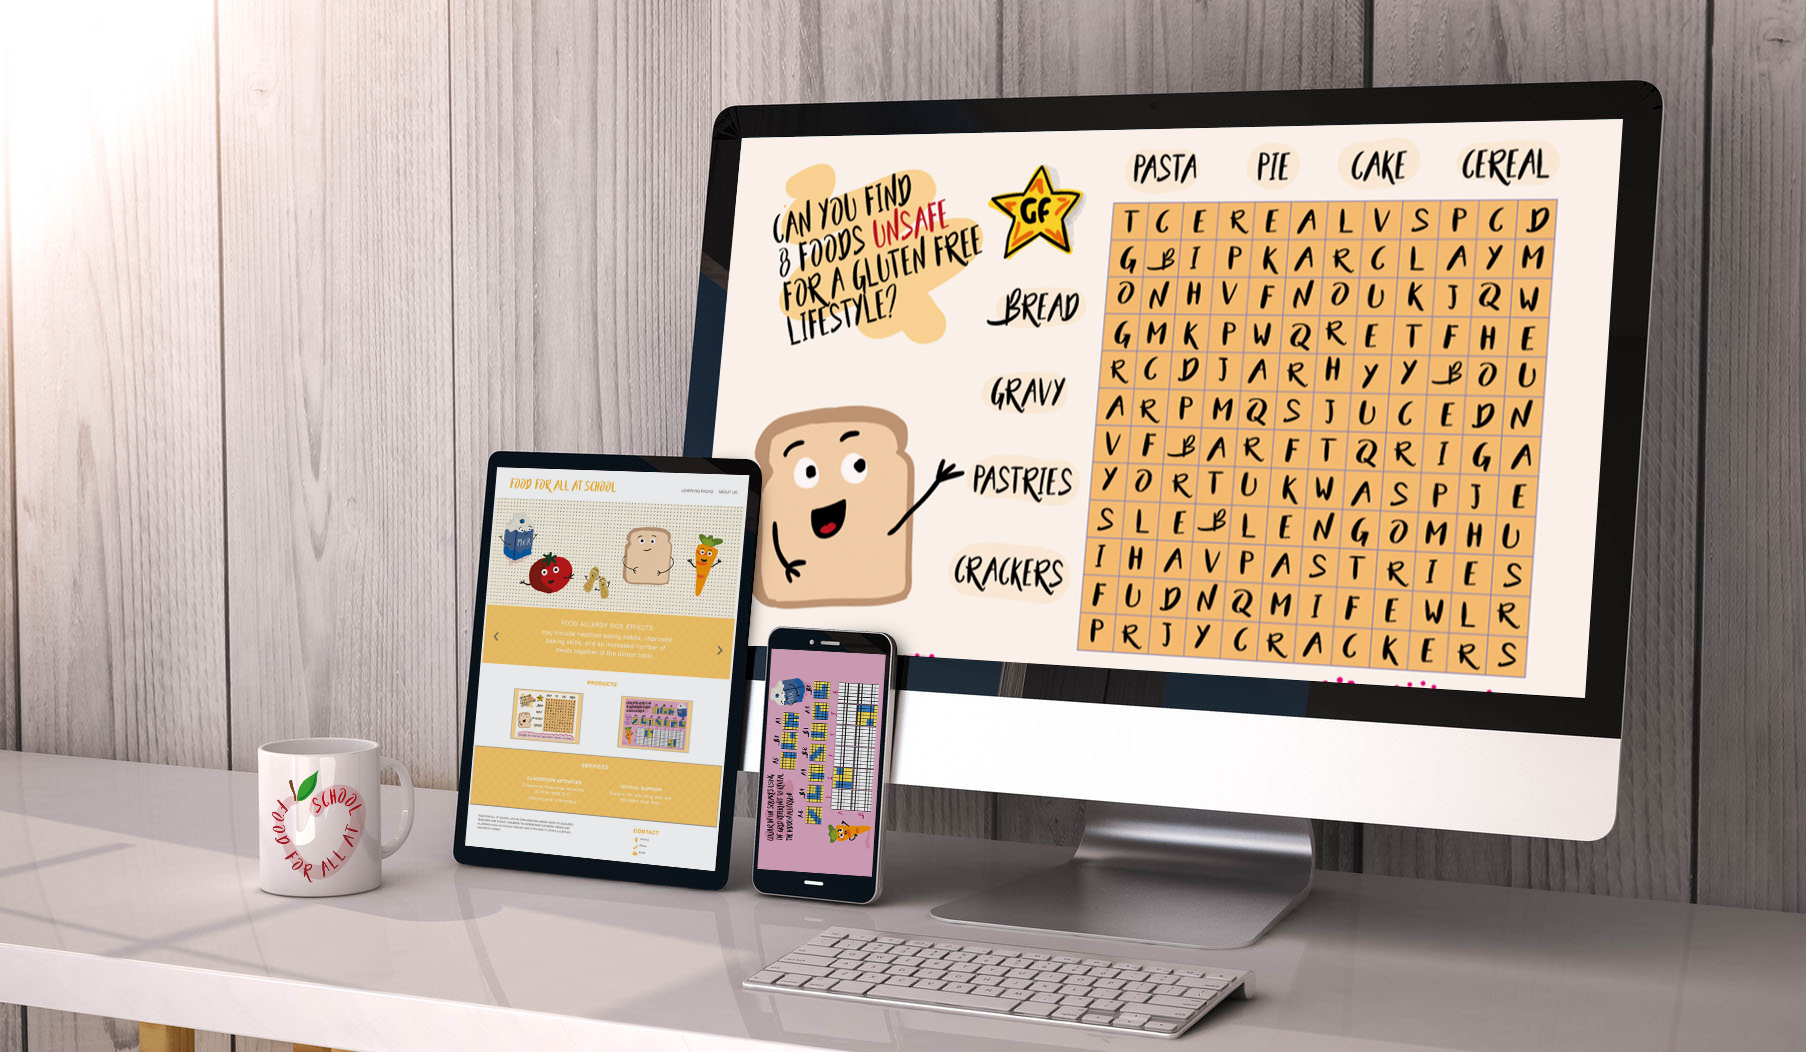 Sally Platt graphic design and communication work example 2